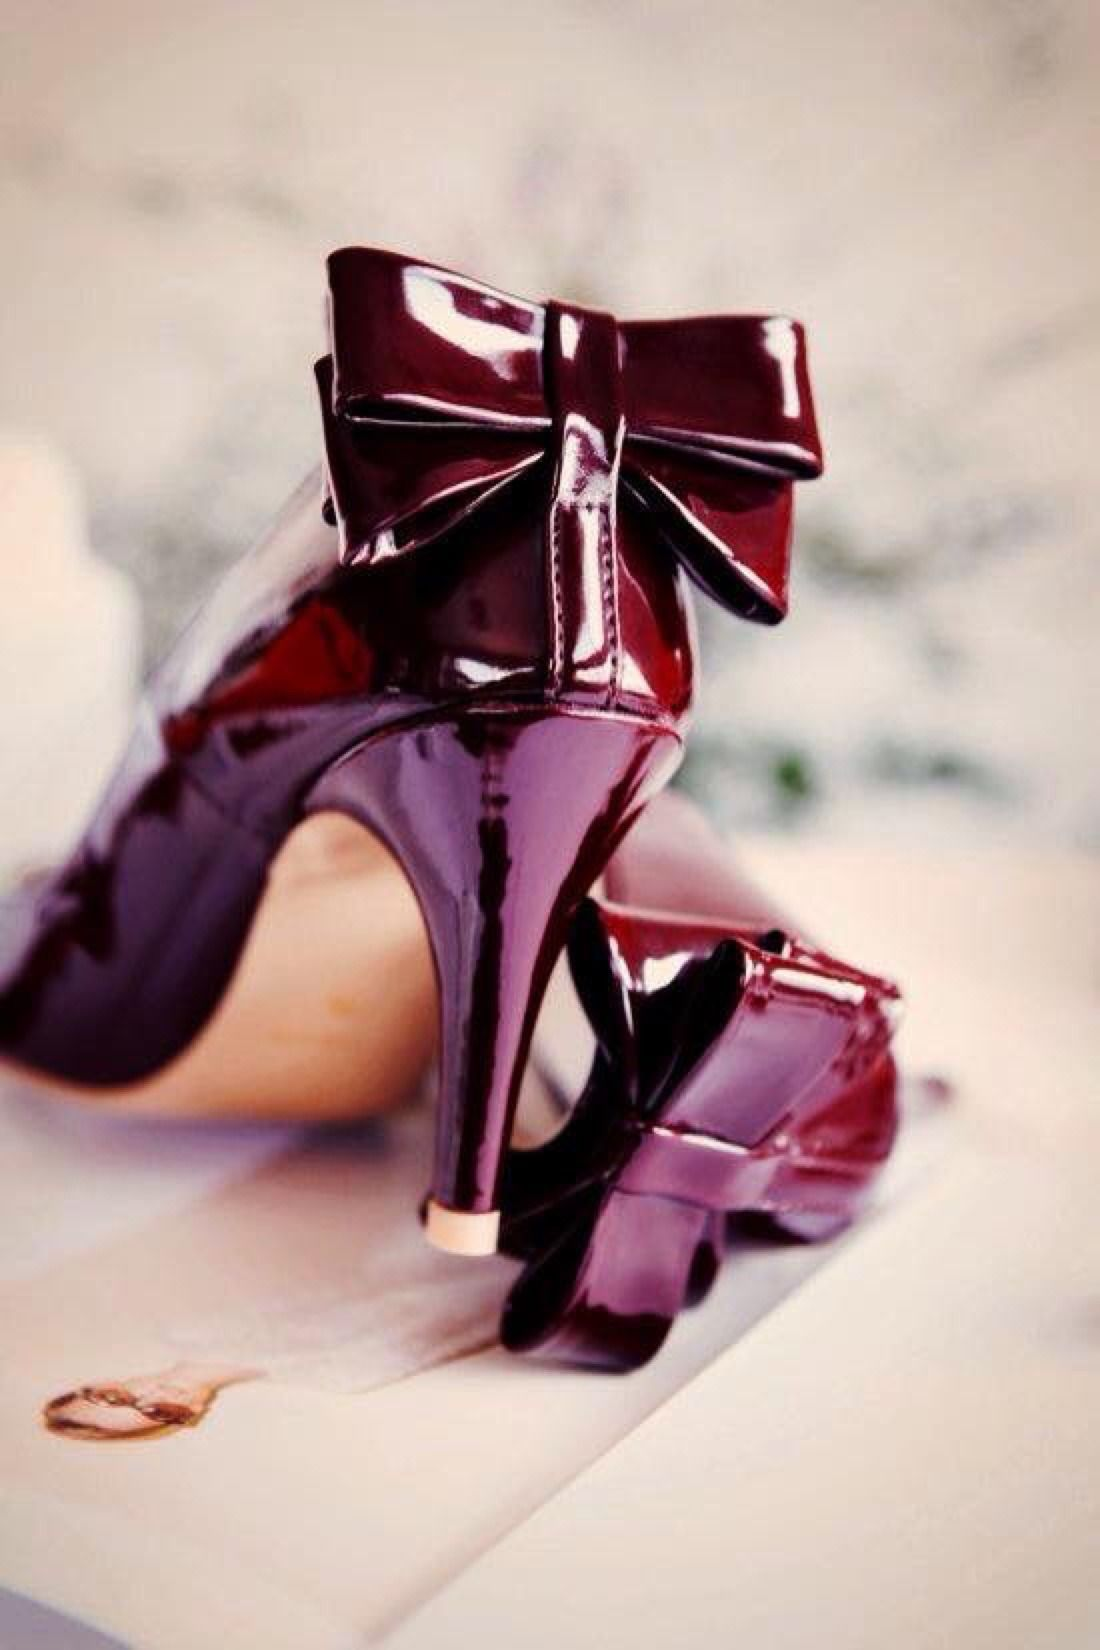 Pin by romana kucerova on Burgund¥ M d | Burgundy shoes, Burgundy fashion, Burgundy